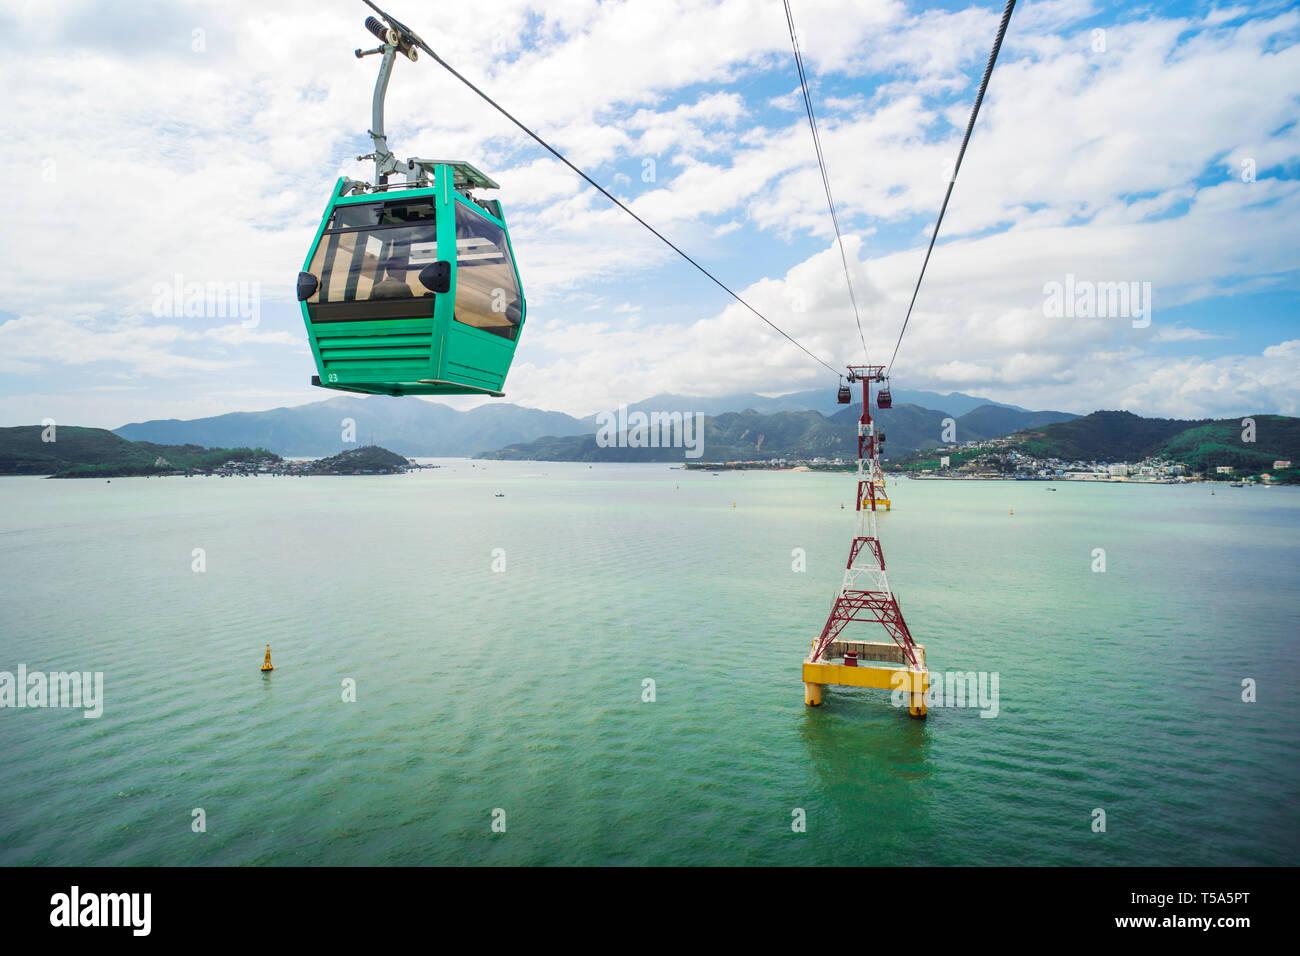 The view towards Nha Trang and VinPearl cable car from Nha Trang bay in Vietnam. - Stock Image